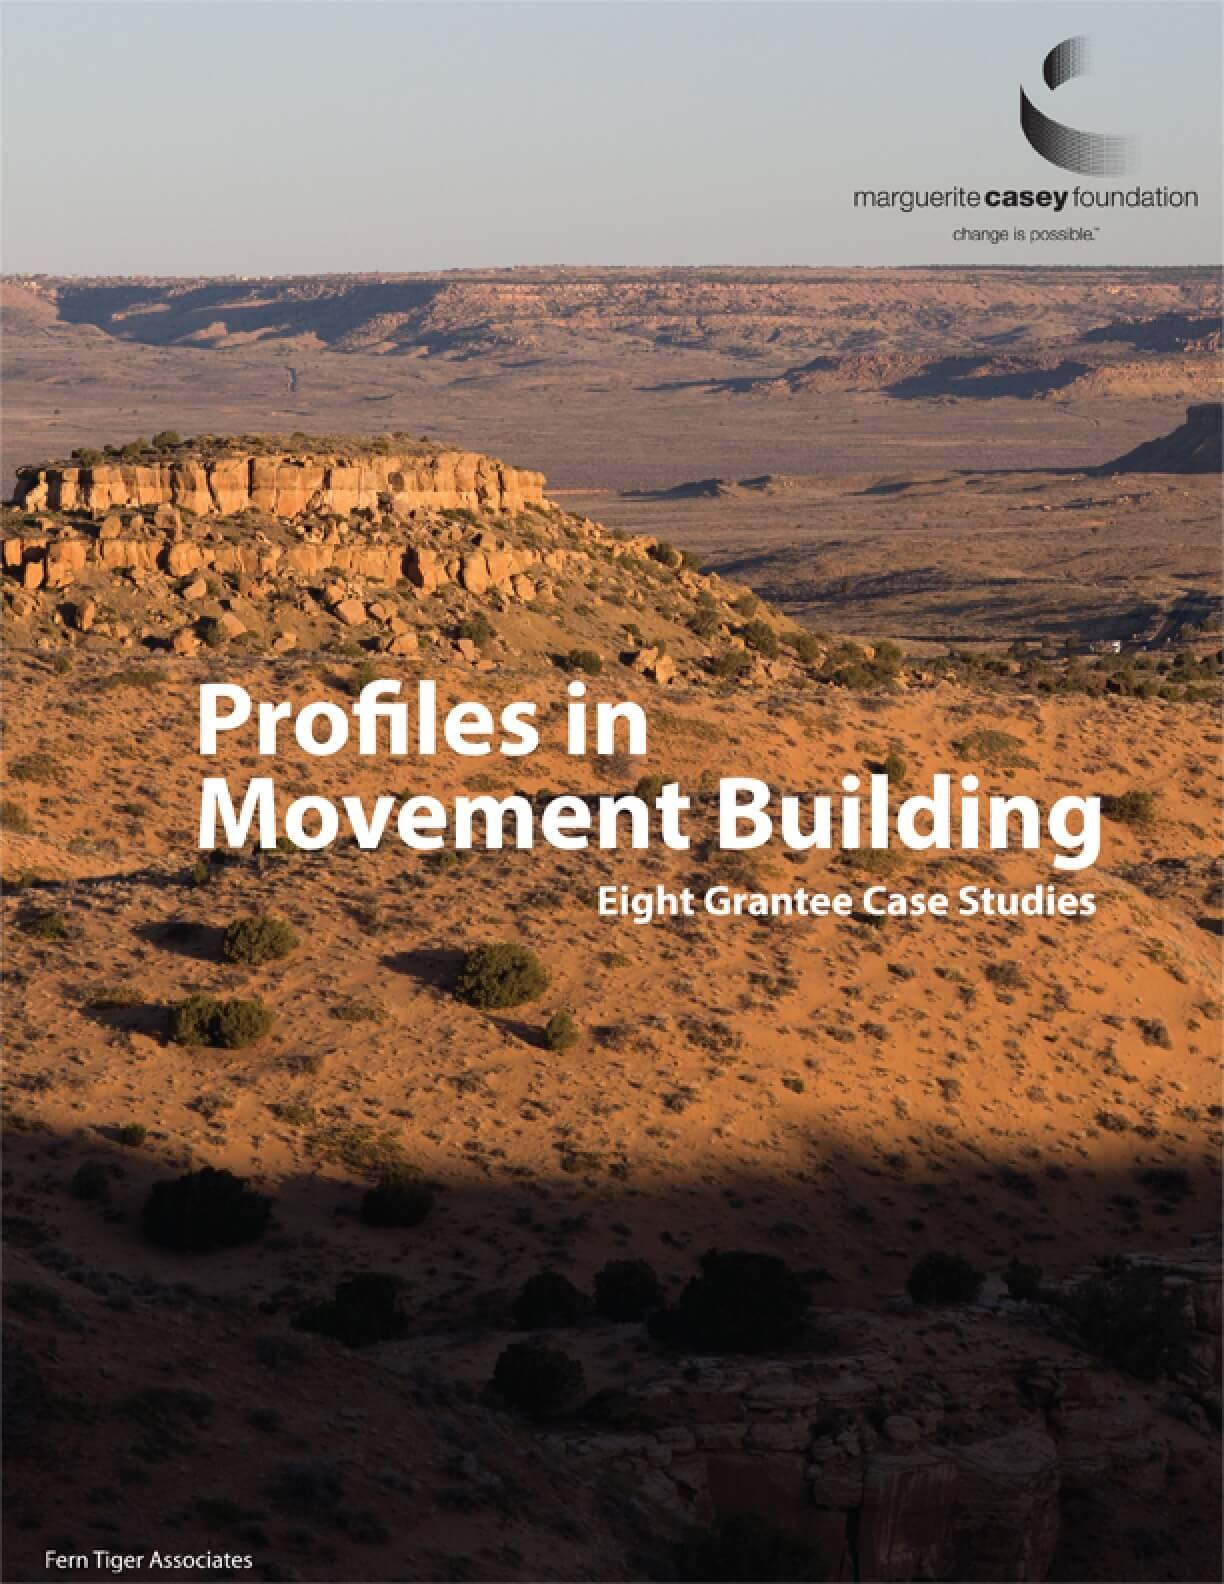 Profiles in Movement Building